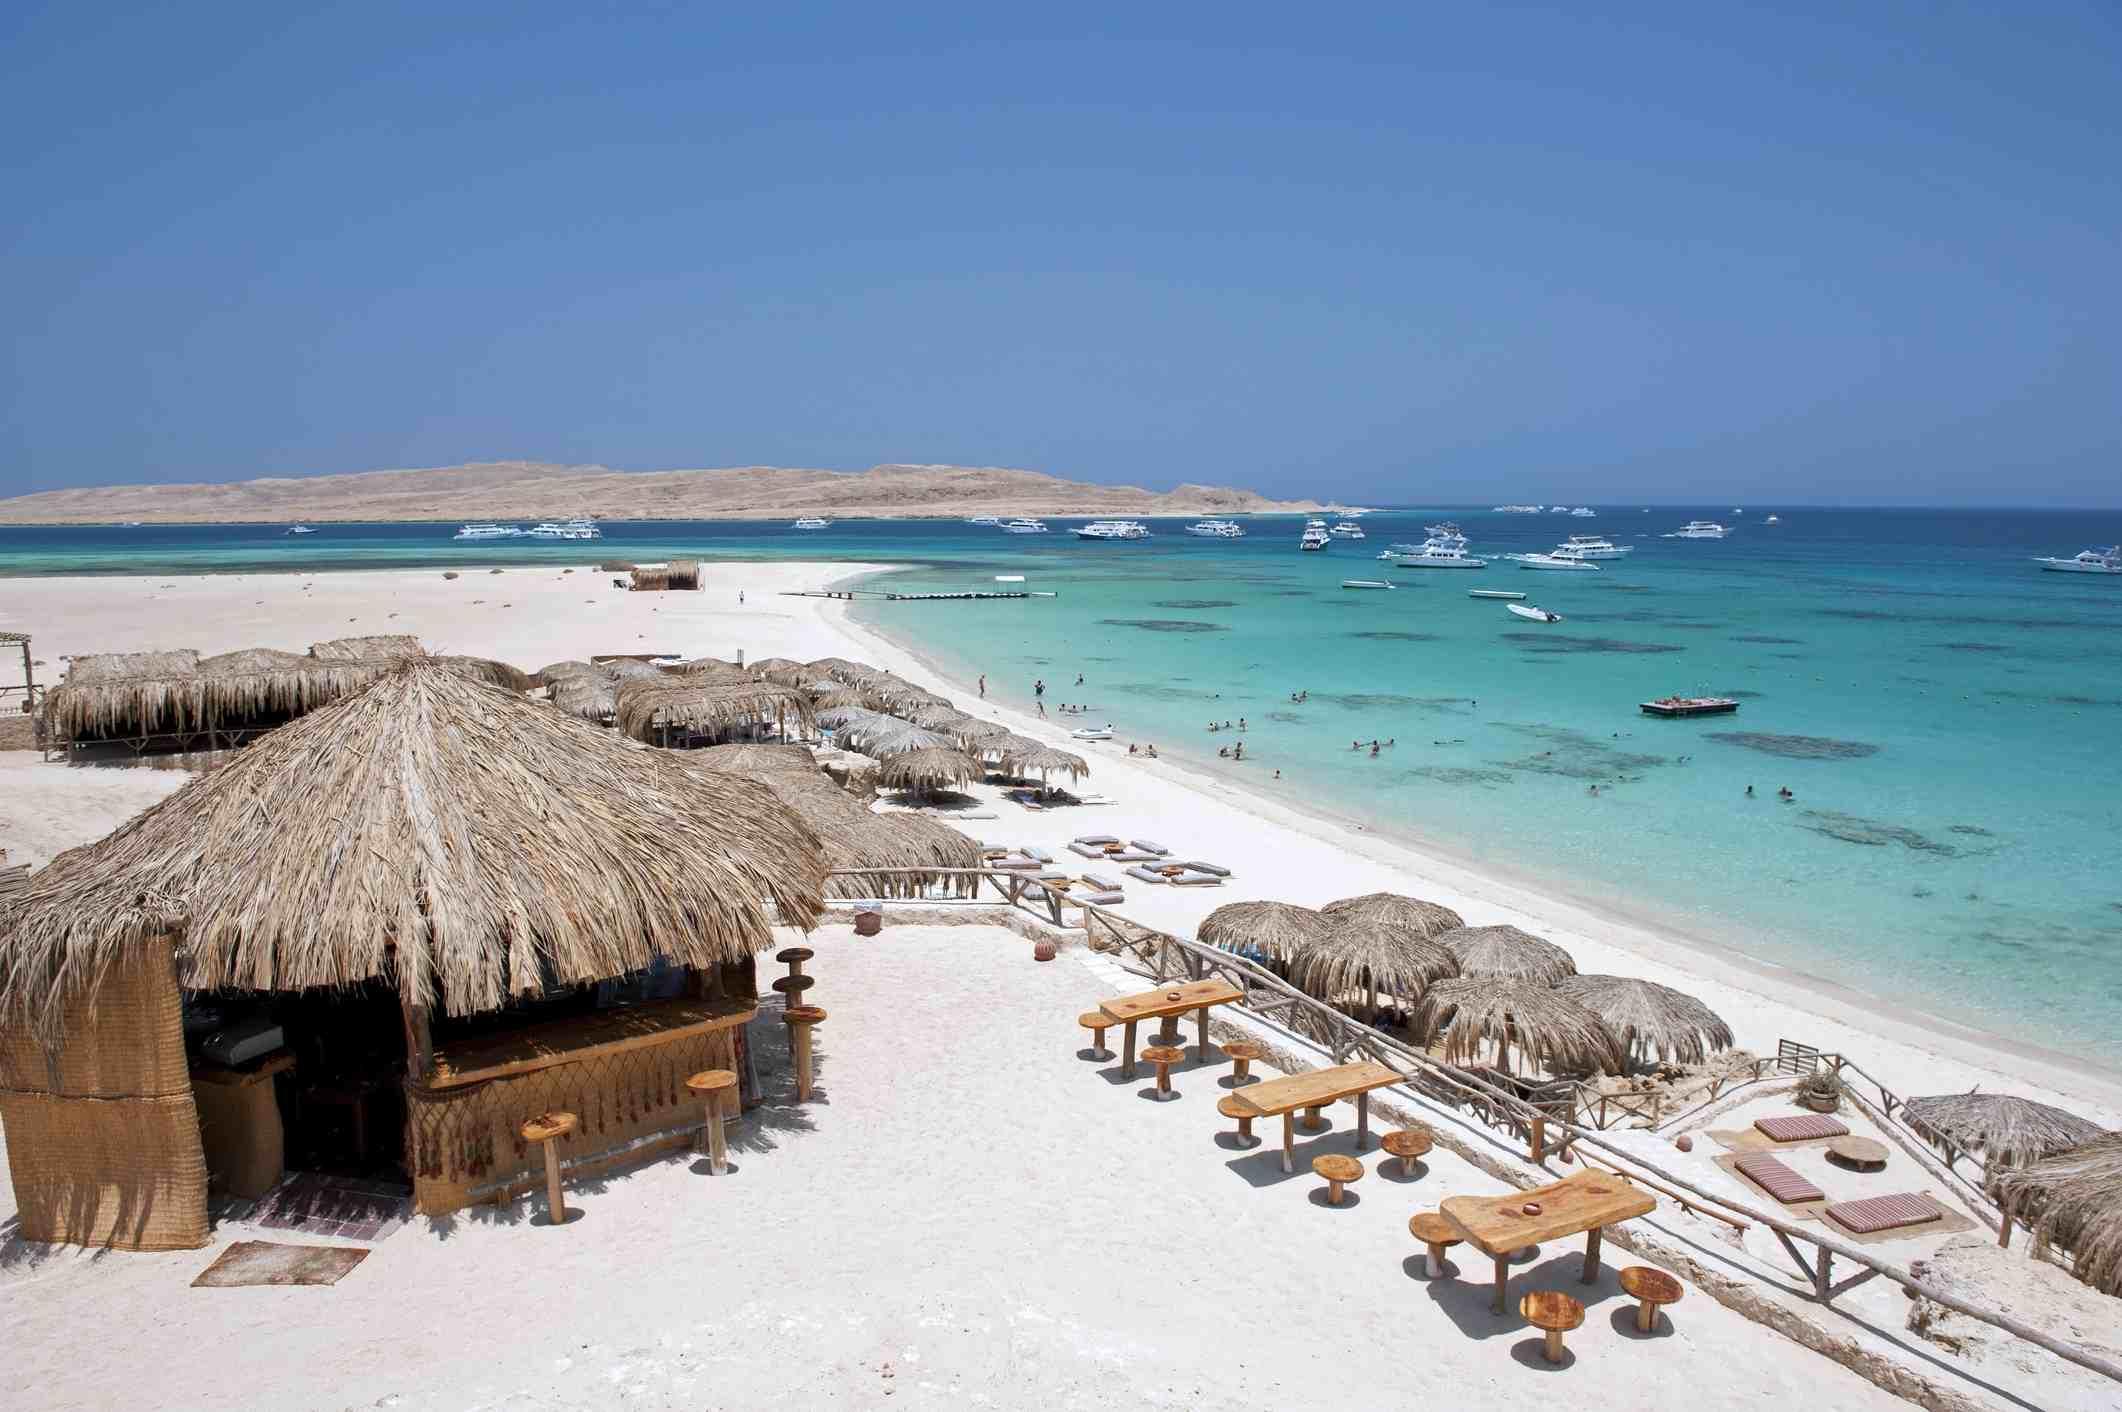 Giftun Island near Hurghada, Egypt